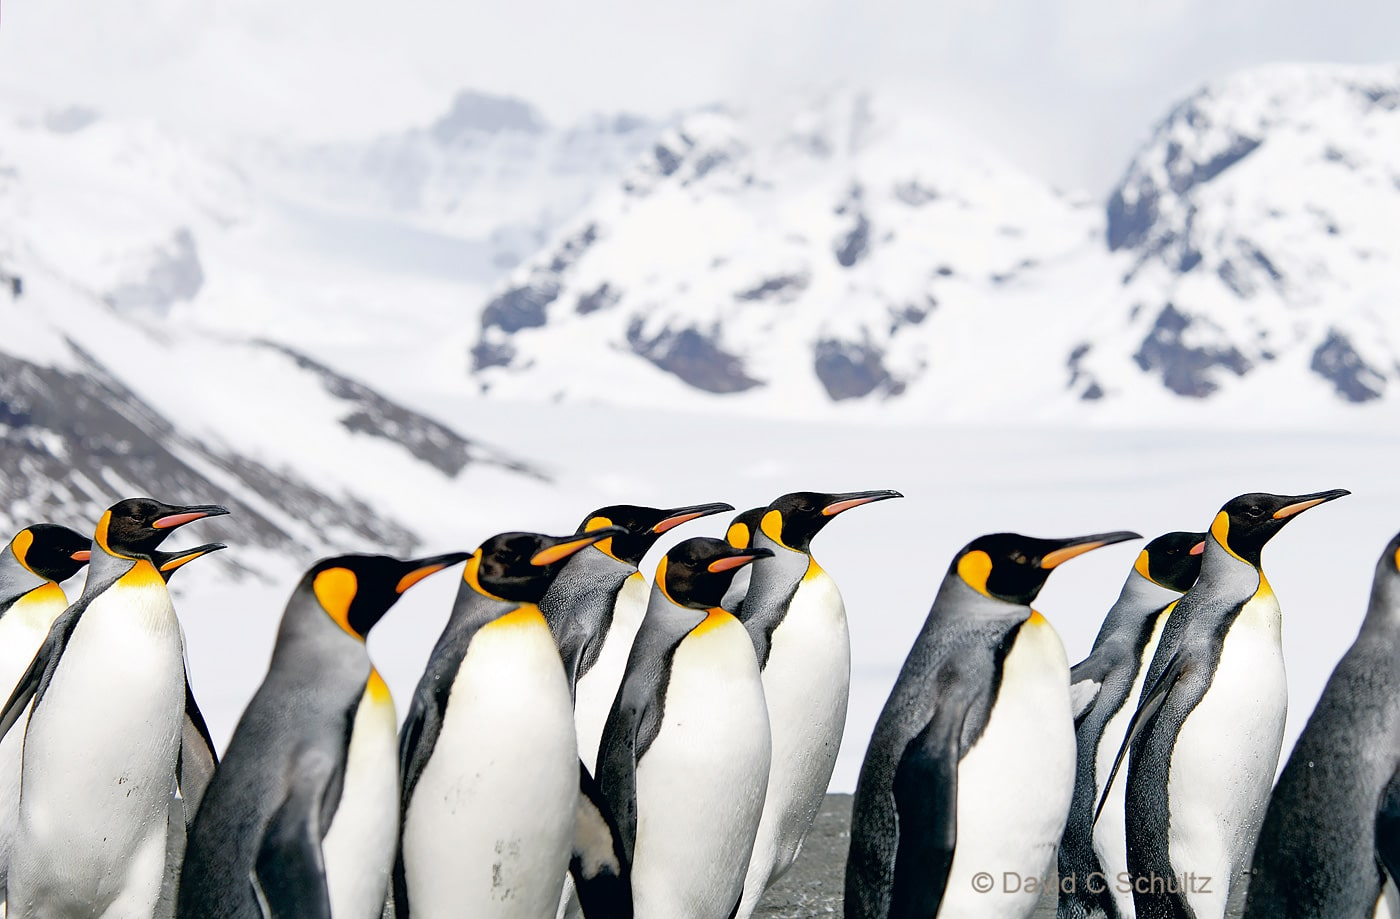 King penguins on South Georgia Island - Image #163-371